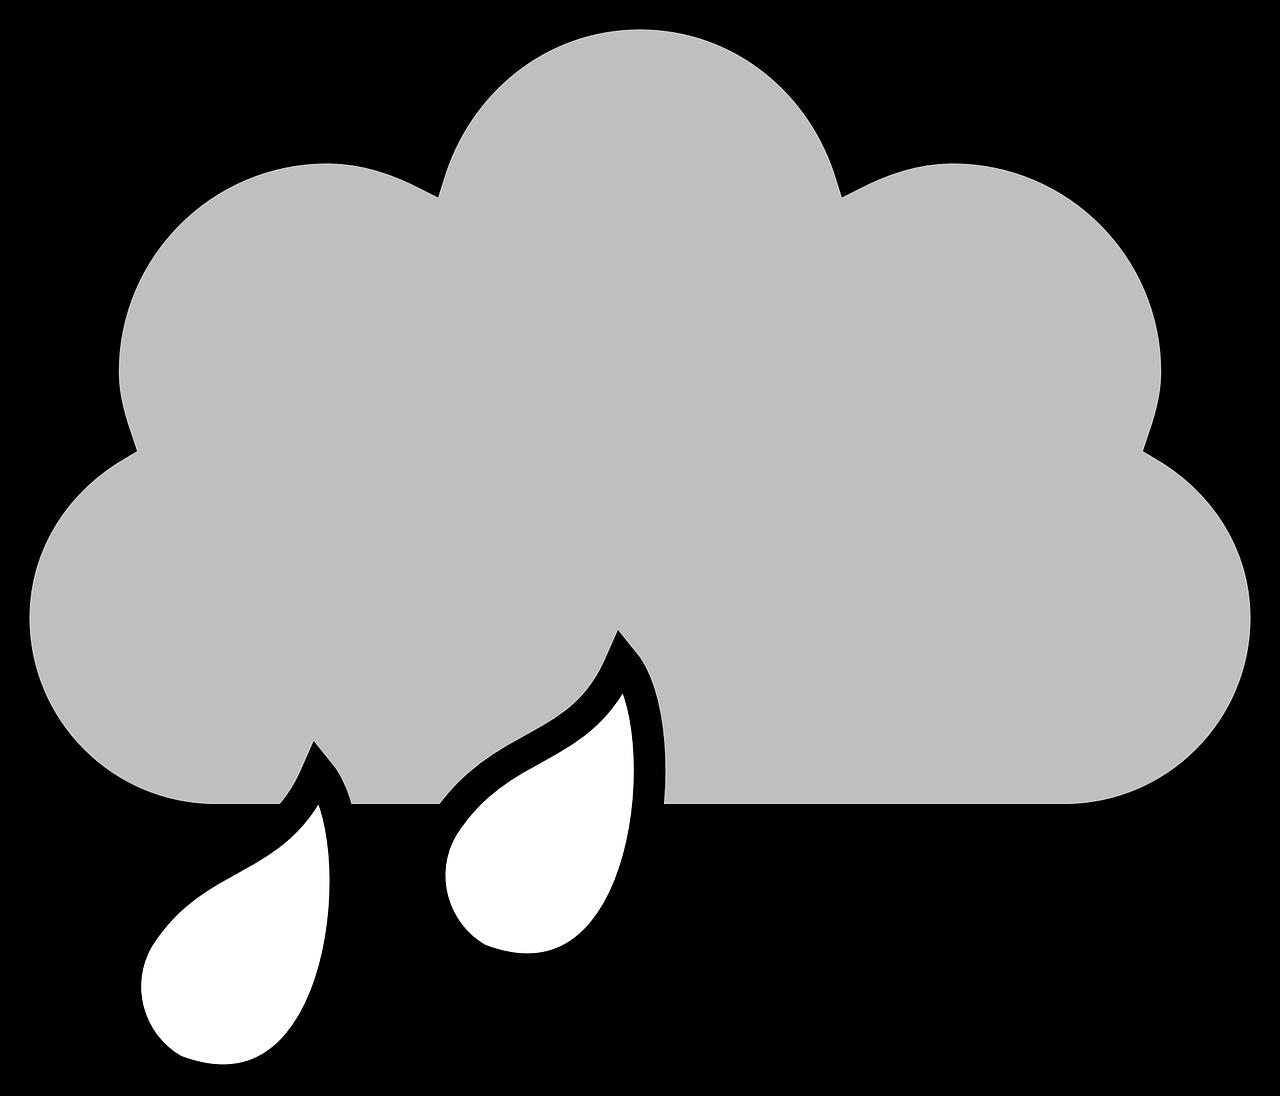 Transparent raining clipart - Cloud Rain Drops Drawing Sky Nature Weather - Raincloud Clipart